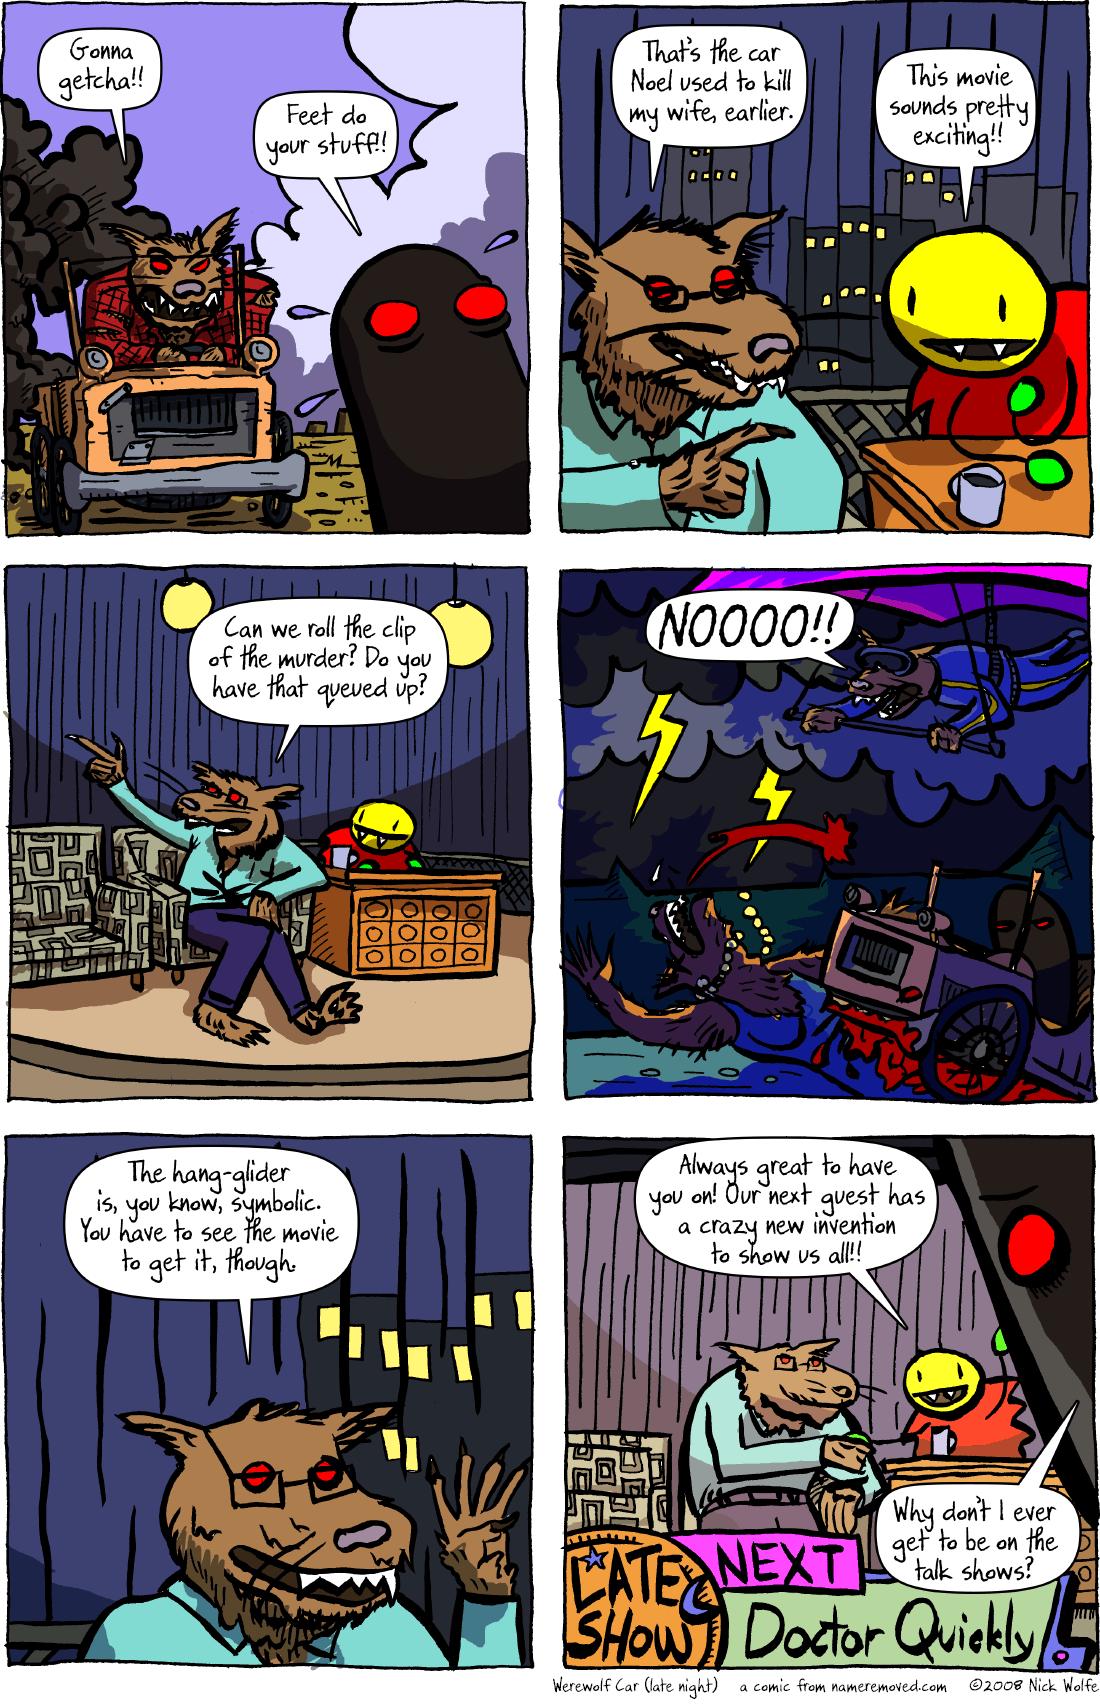 Werewolf Car (late night)